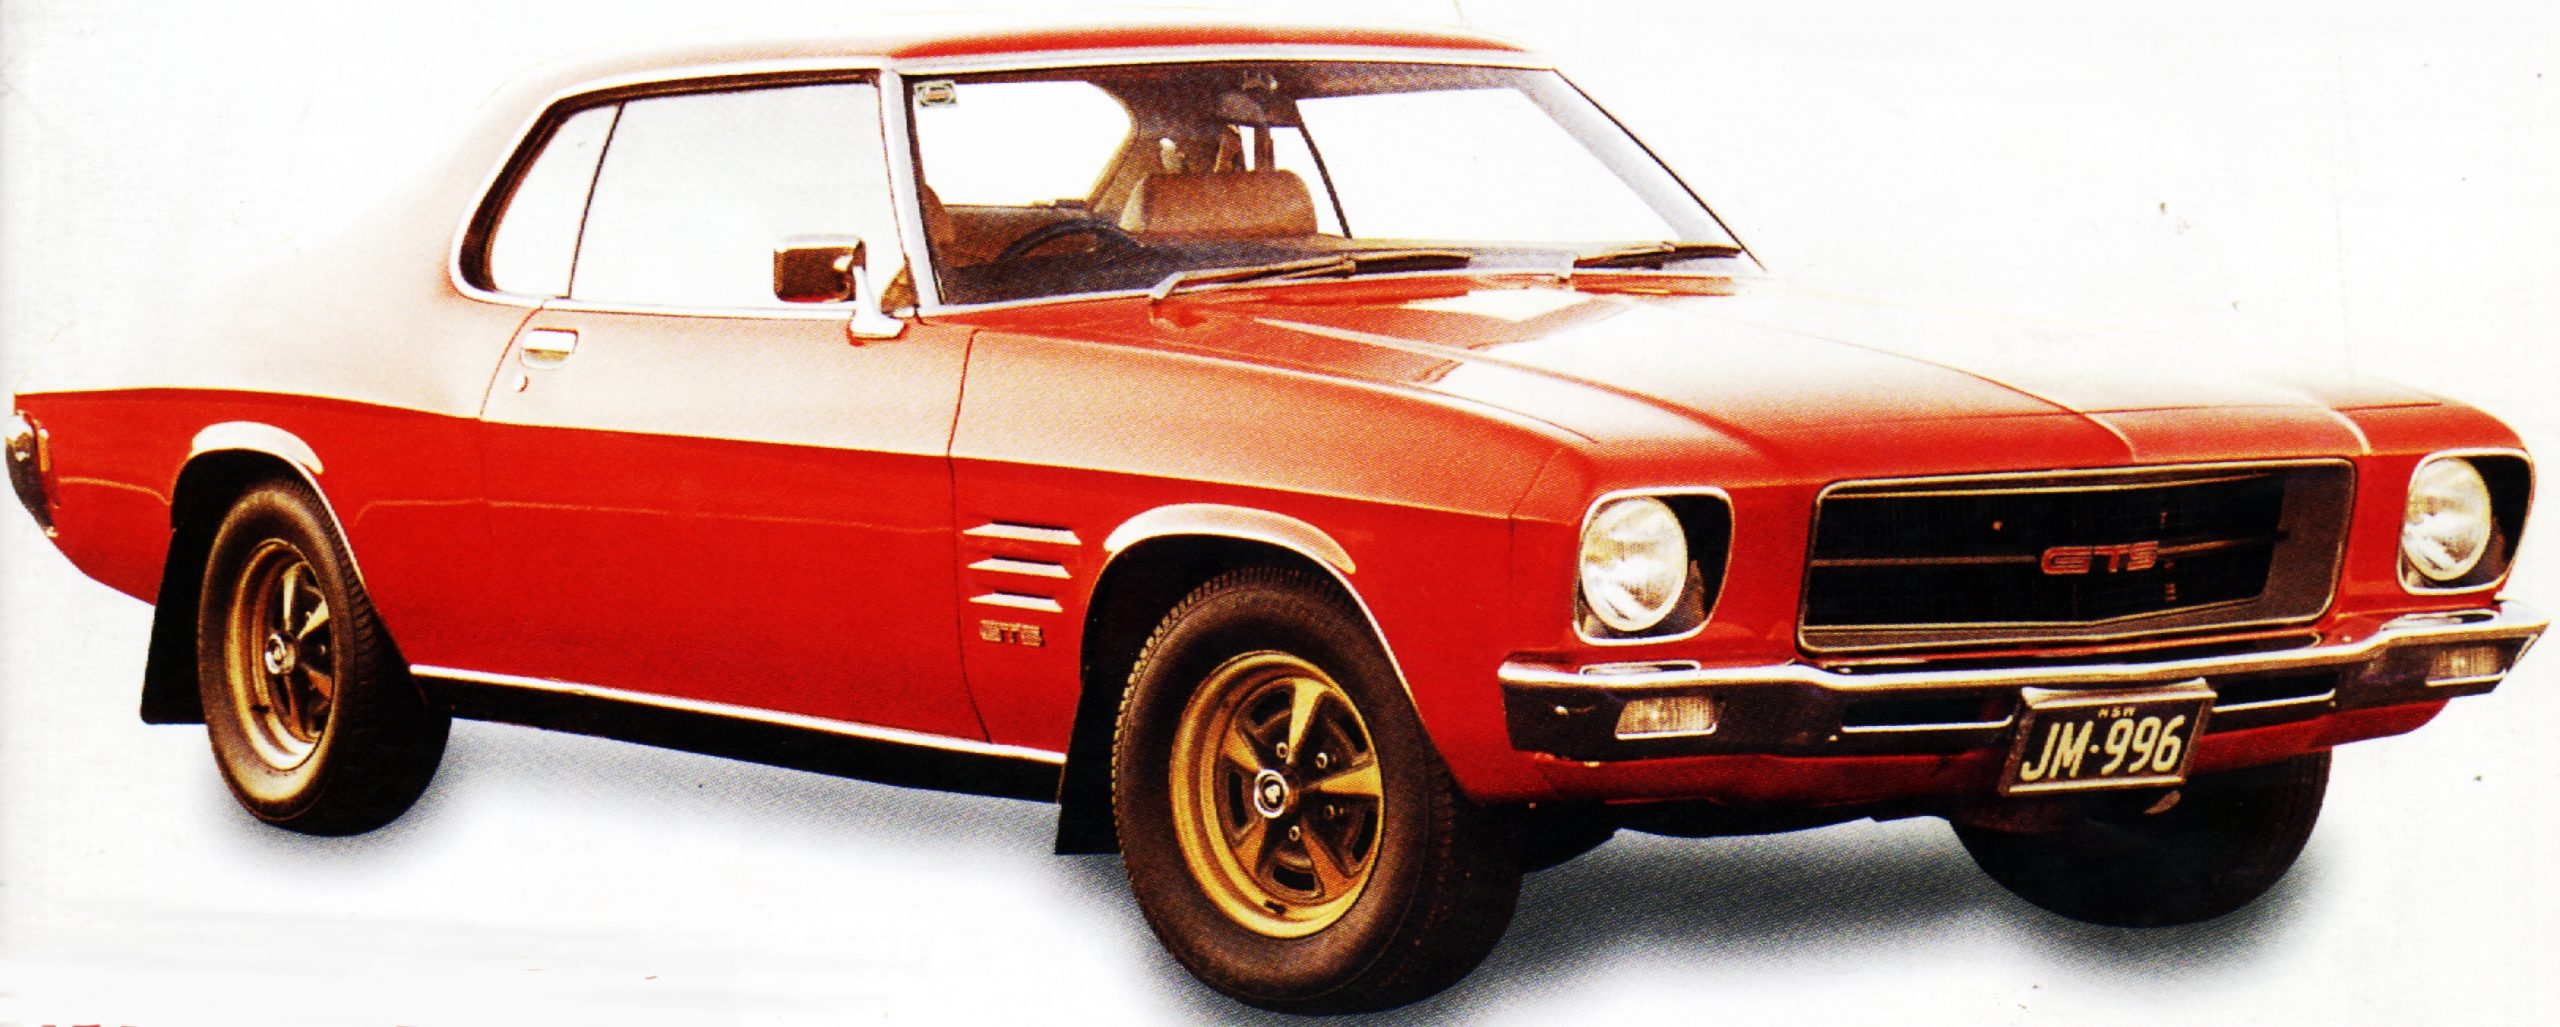 Rear HQ HJ HX HZ WB Holden Number Plate Mount Rubber Grommet Front